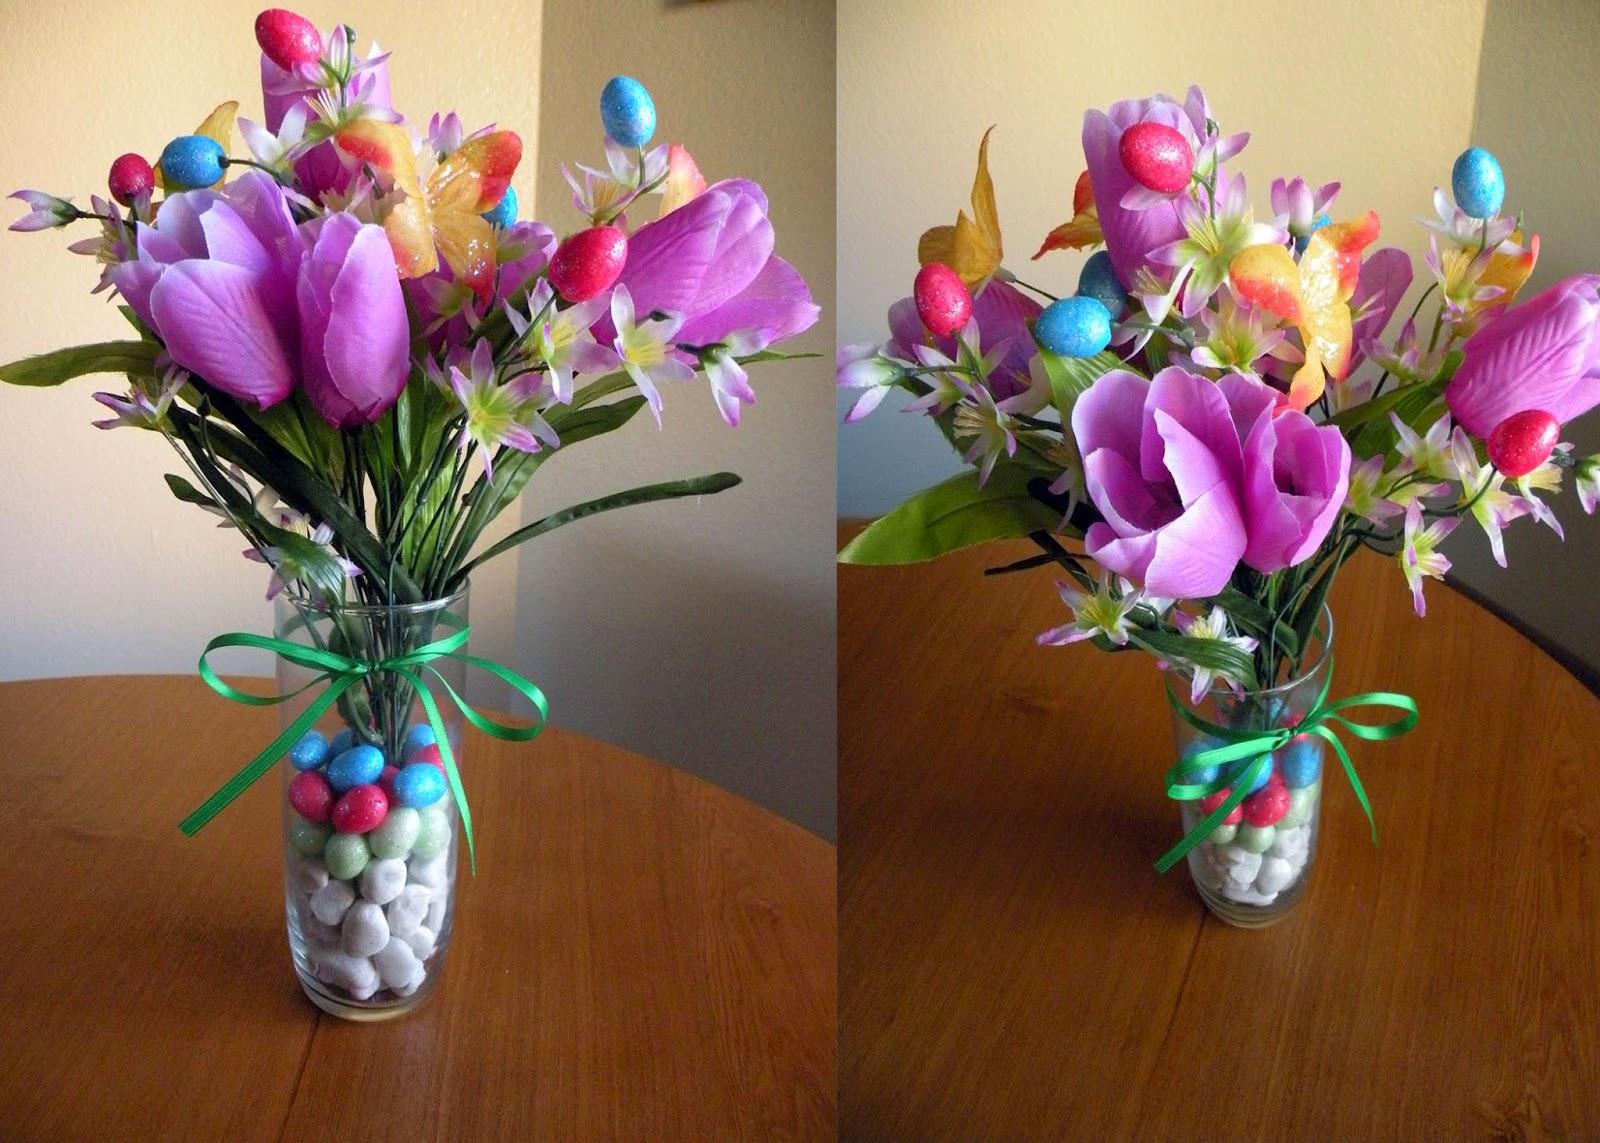 Spring Time or Easter Centerpiece under $5